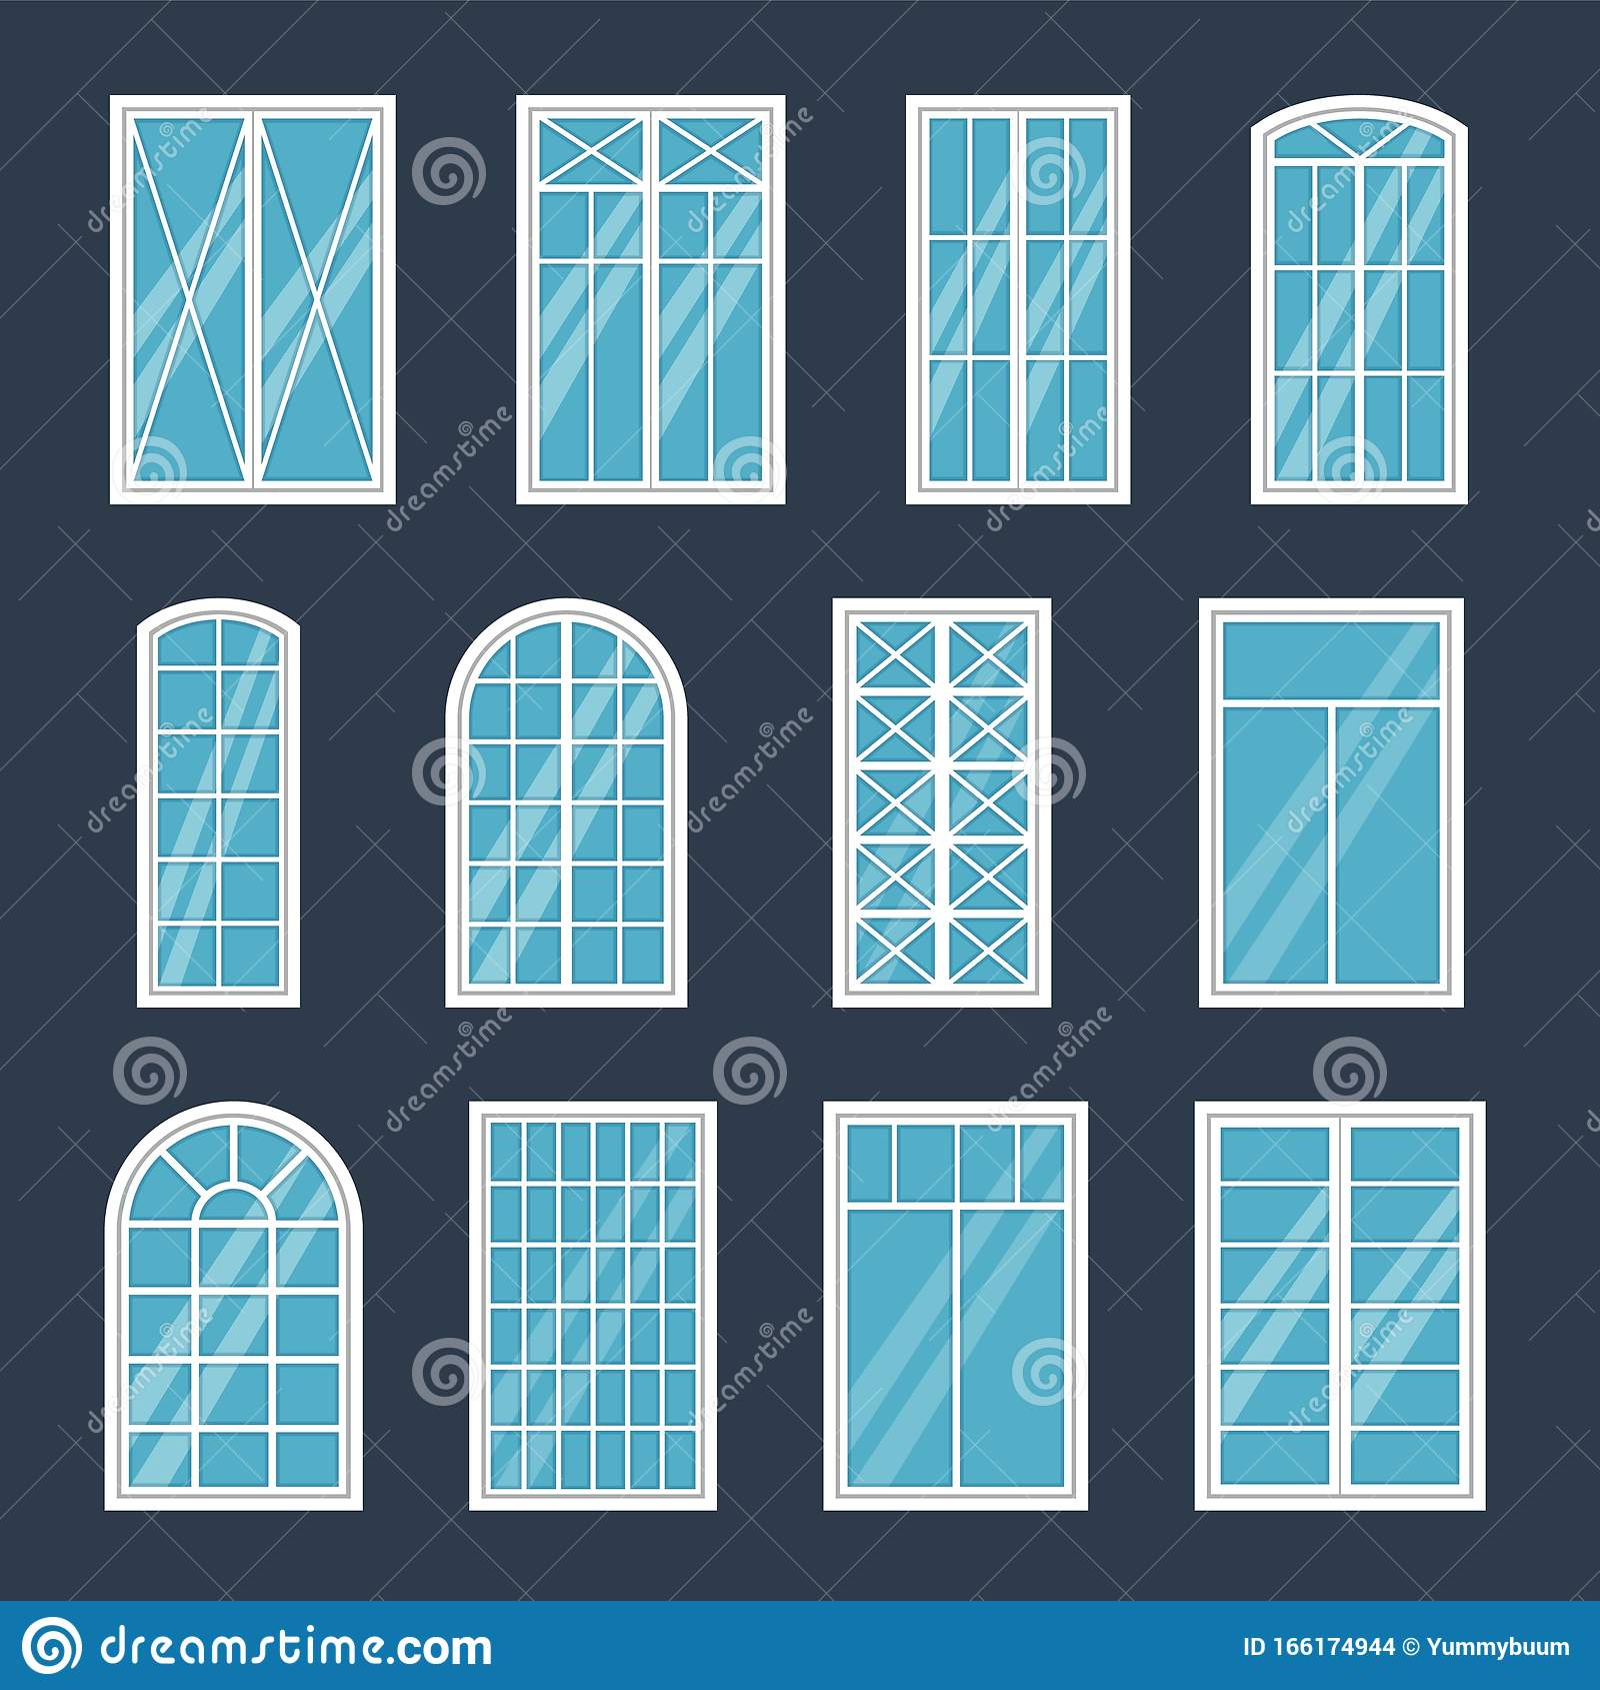 Window Exterior Various Glass Windows Frame Types Construction Sashes Design Modern Architecture House Interior Flat Stock Vector Illustration Of Frame Interior 166174944